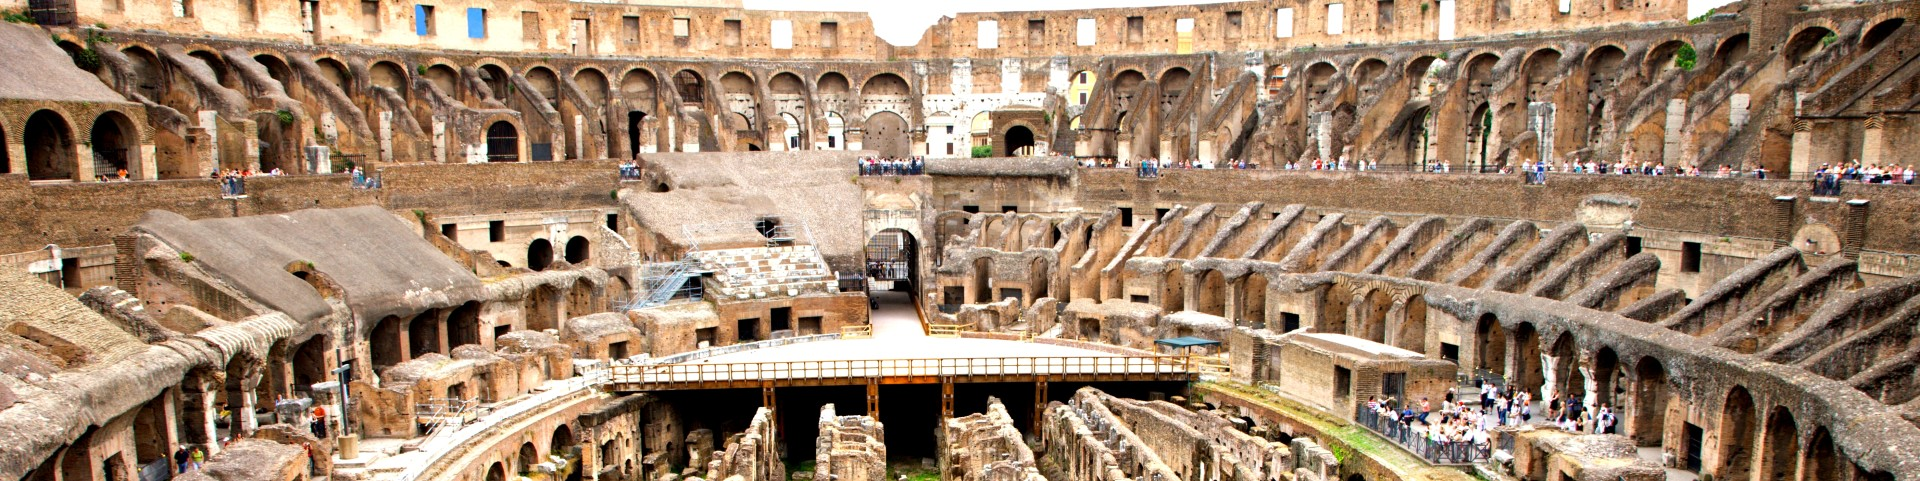 Roma - Colosseum